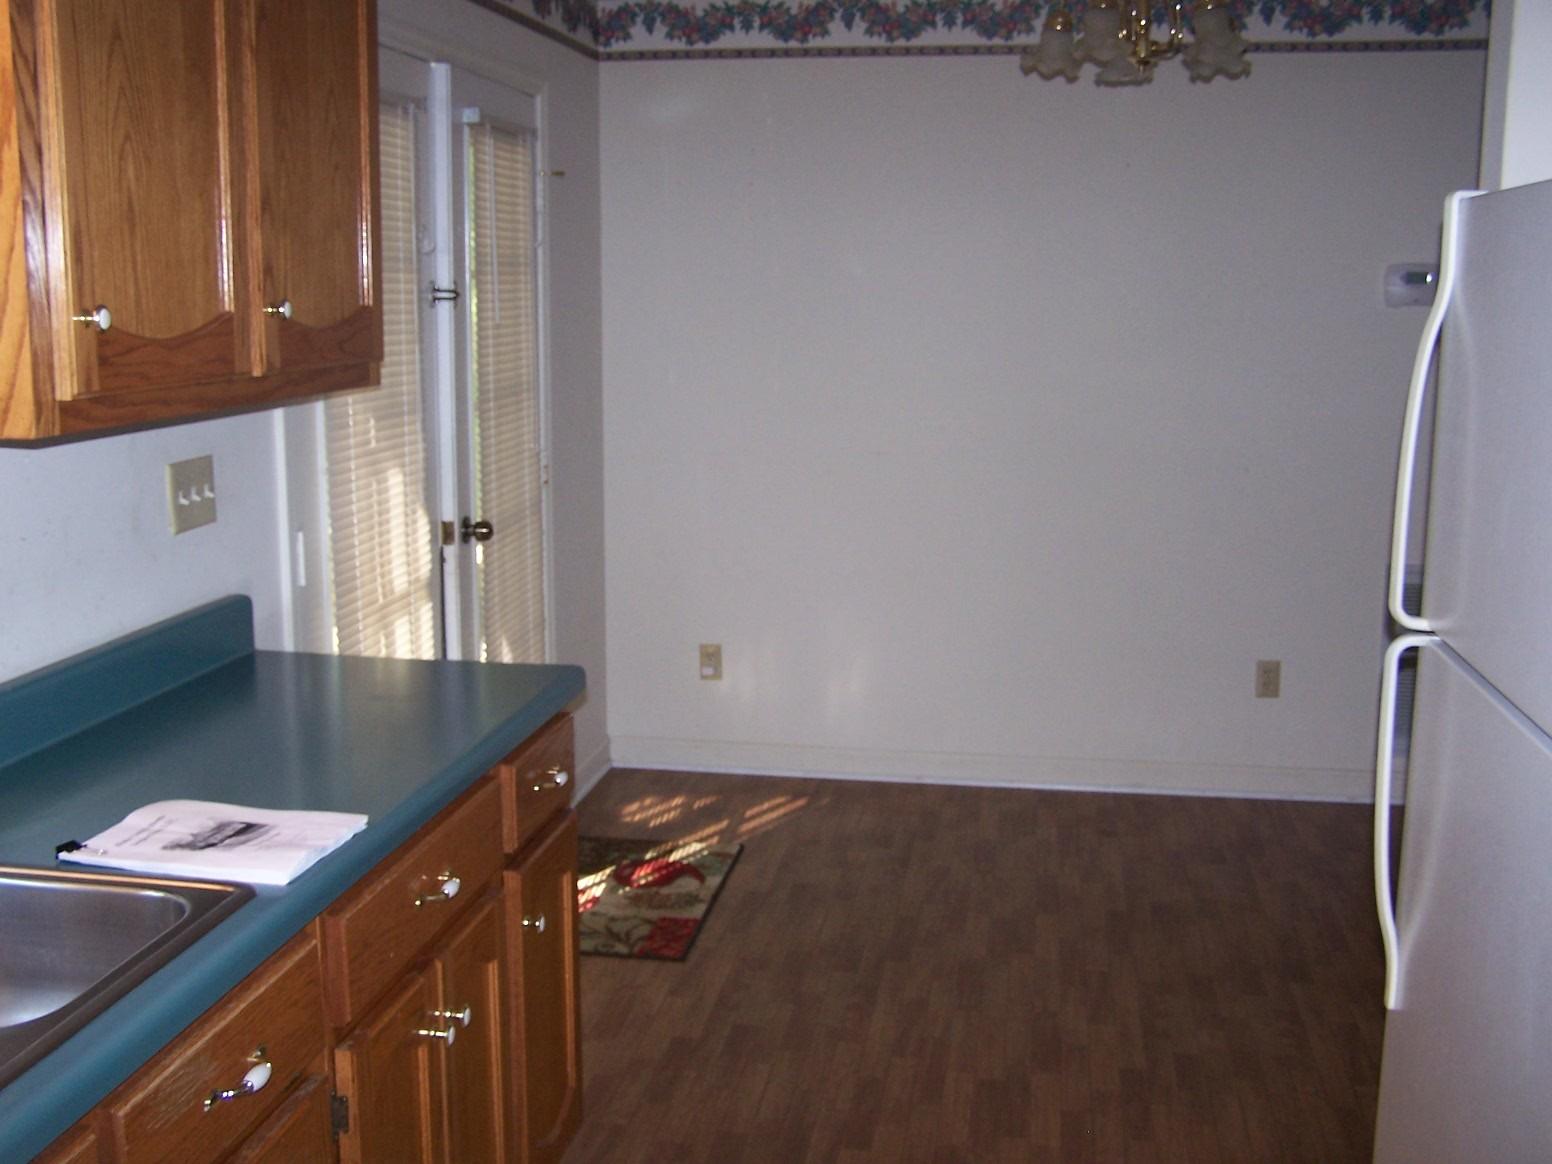 1285 Chicken Creek Rd, Pulaski, Tennessee 38478, 3 Bedrooms Bedrooms, ,2 BathroomsBathrooms,Single Family,For Sale,1285 Chicken Creek Rd,1,2245983